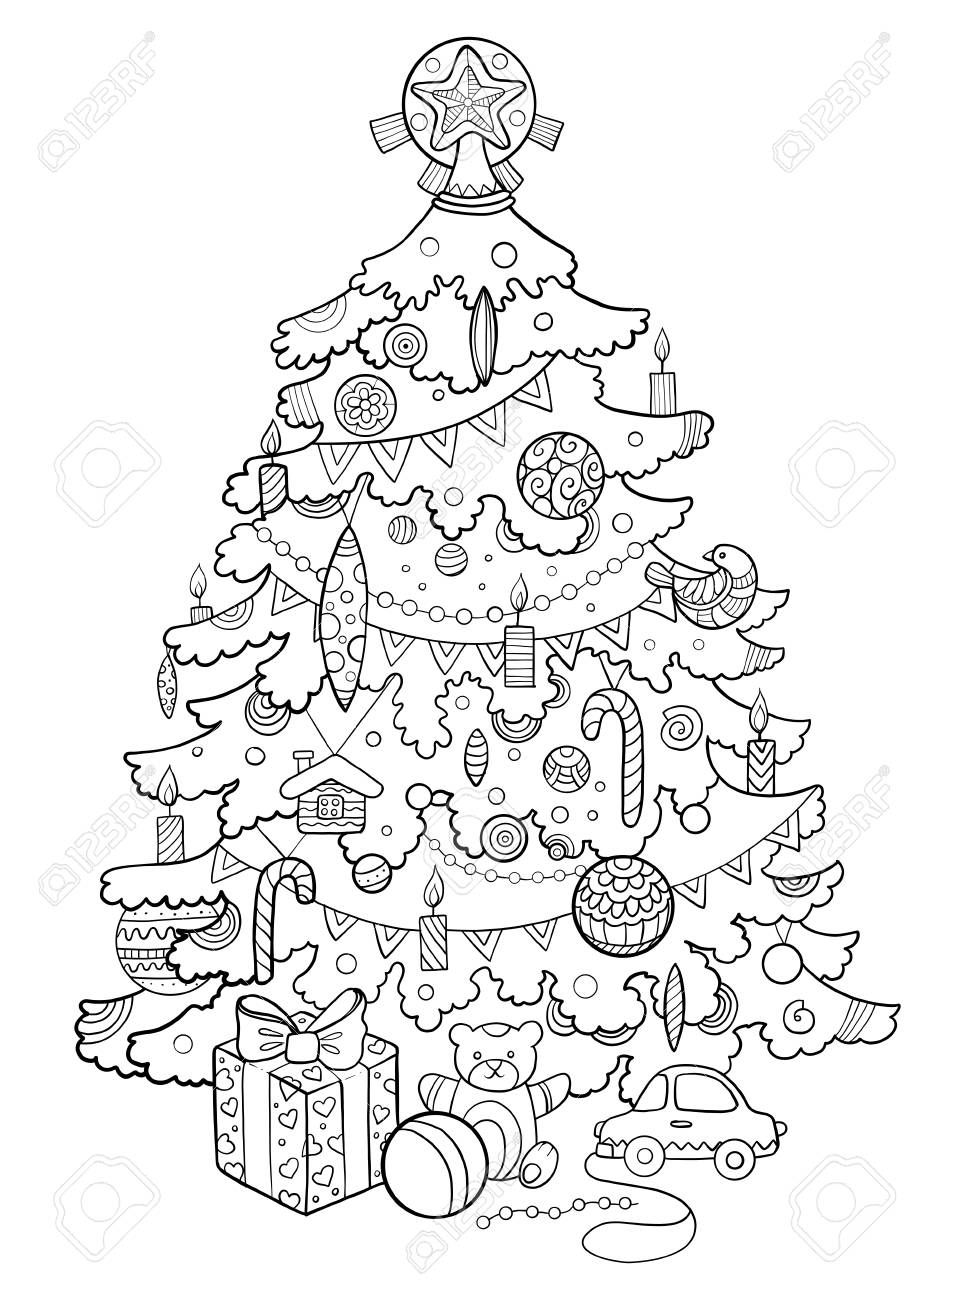 Christmas Tree Cartoon Coloring Book Vector Illustration Sponsored Cartoon Tree Chr Christmas Coloring Pages Tree Coloring Page Cartoon Coloring Pages